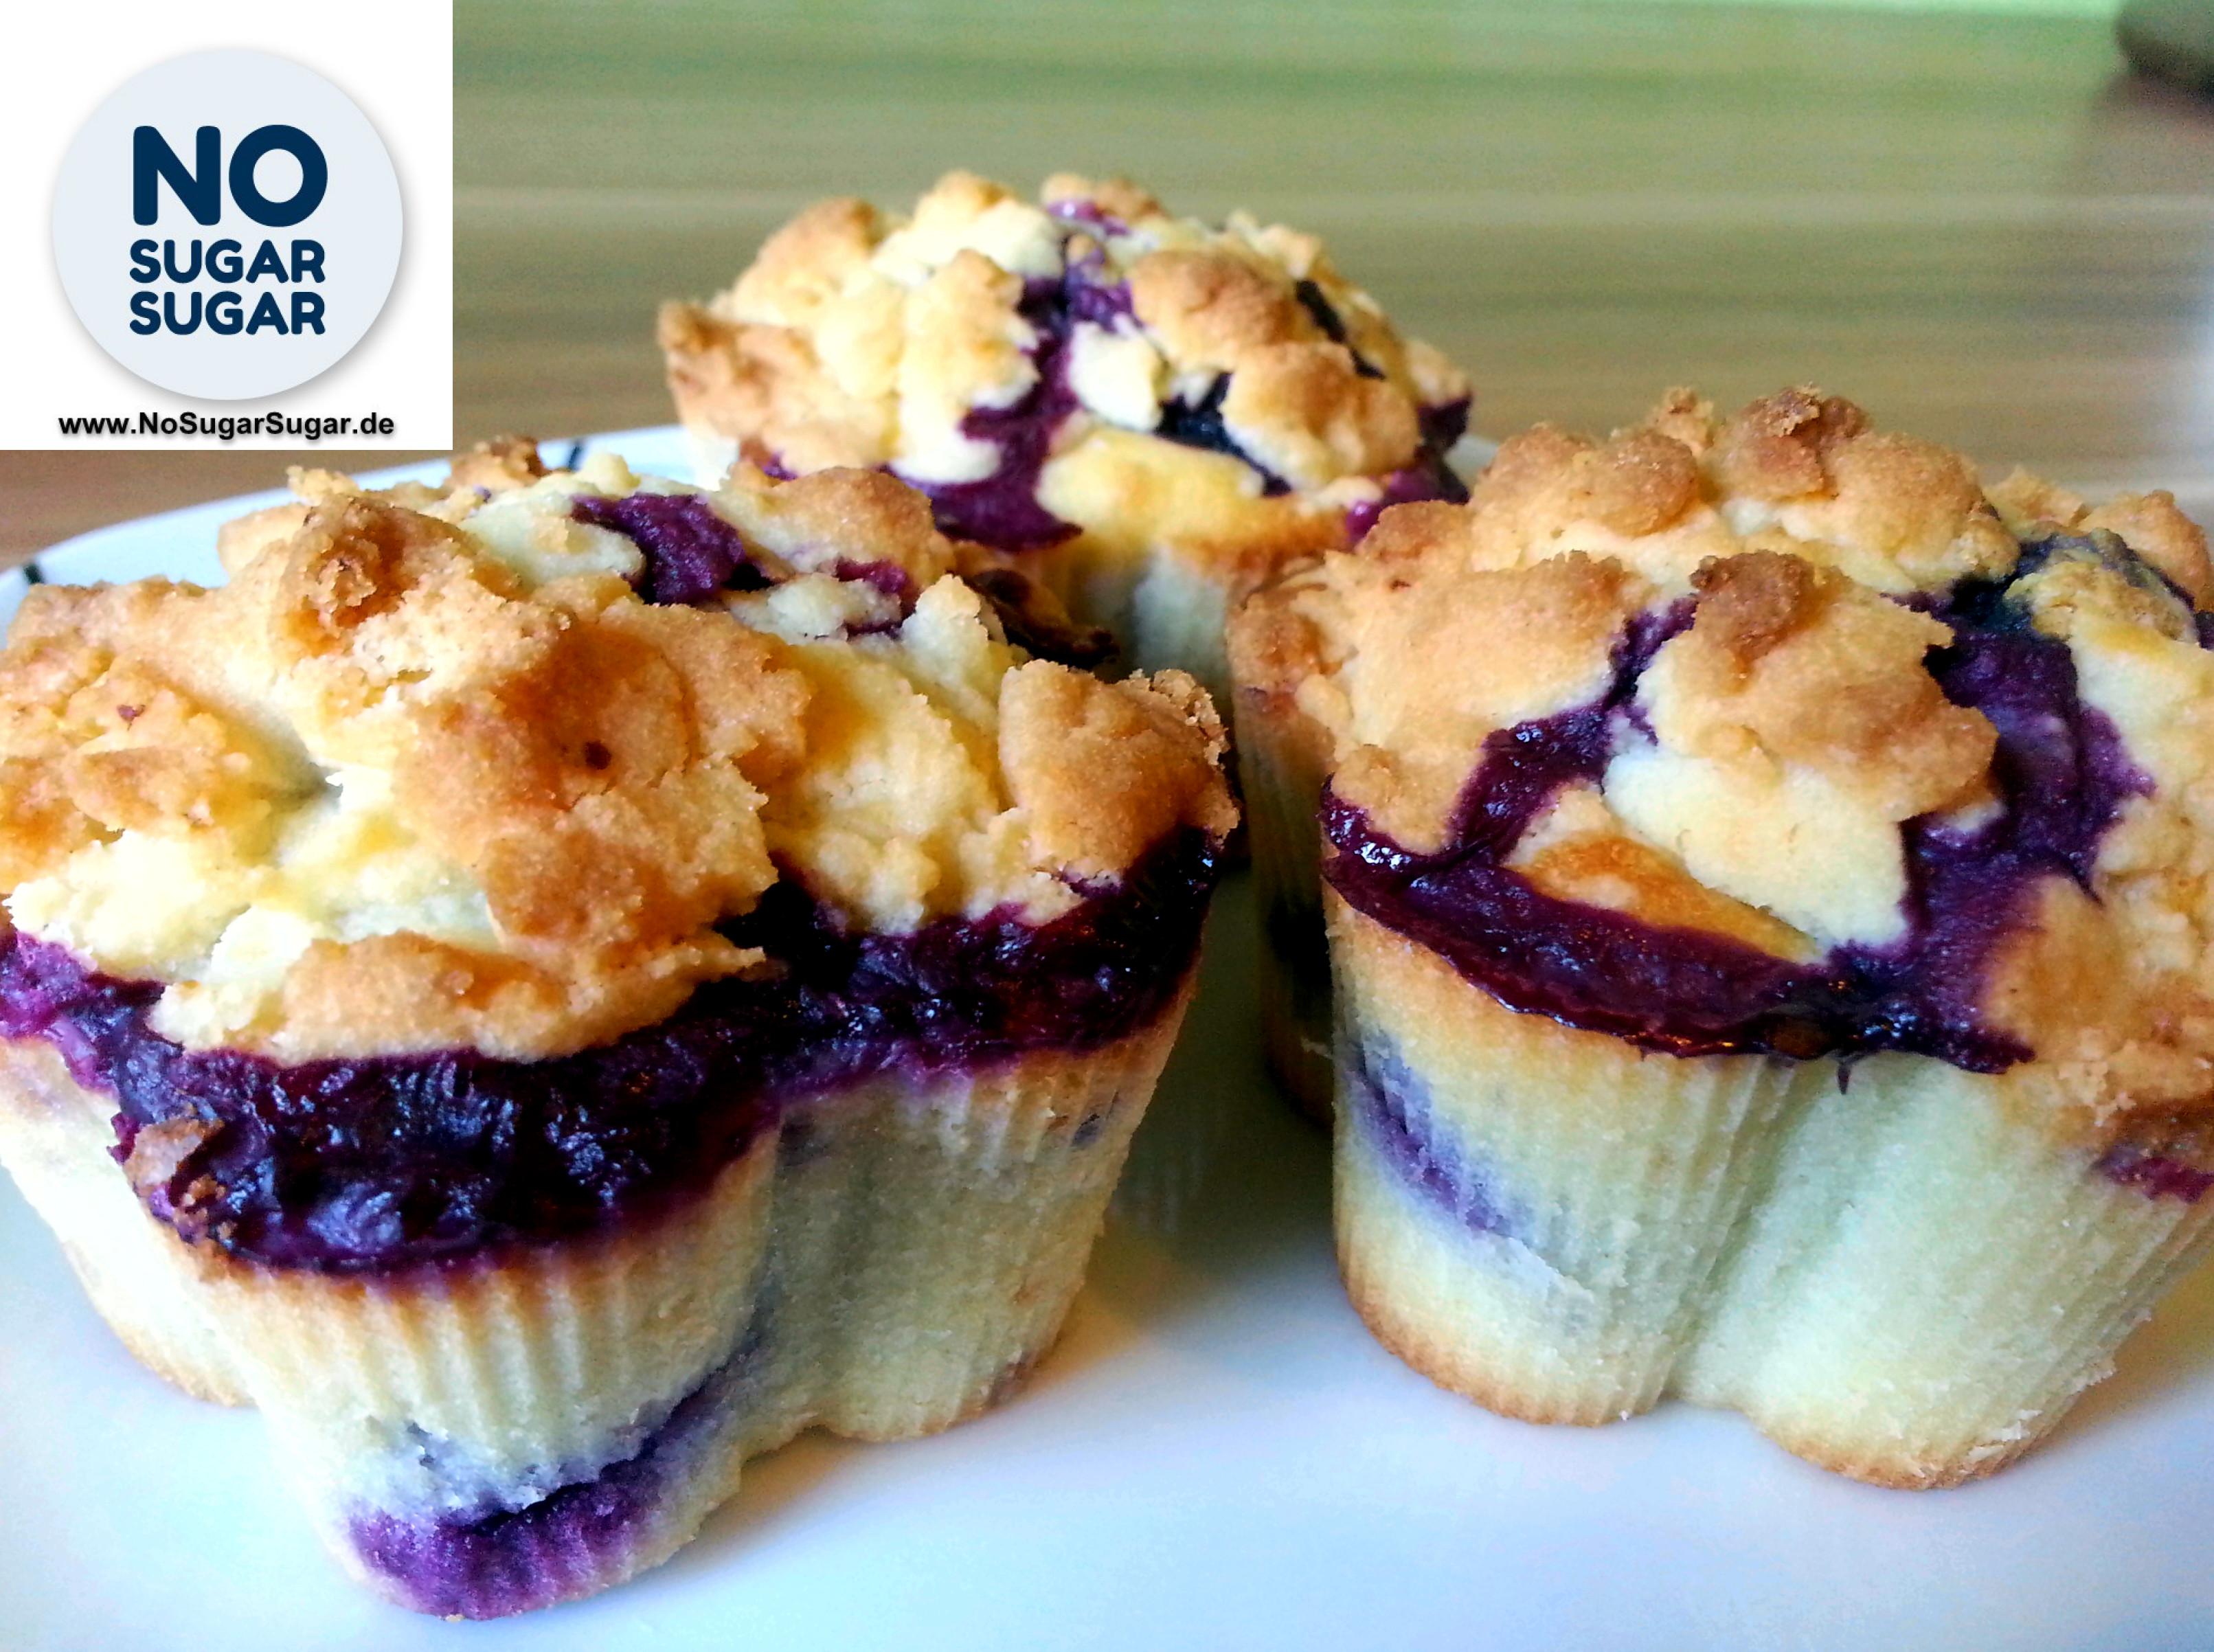 blaubeer muffin low carb rezepte suchen. Black Bedroom Furniture Sets. Home Design Ideas